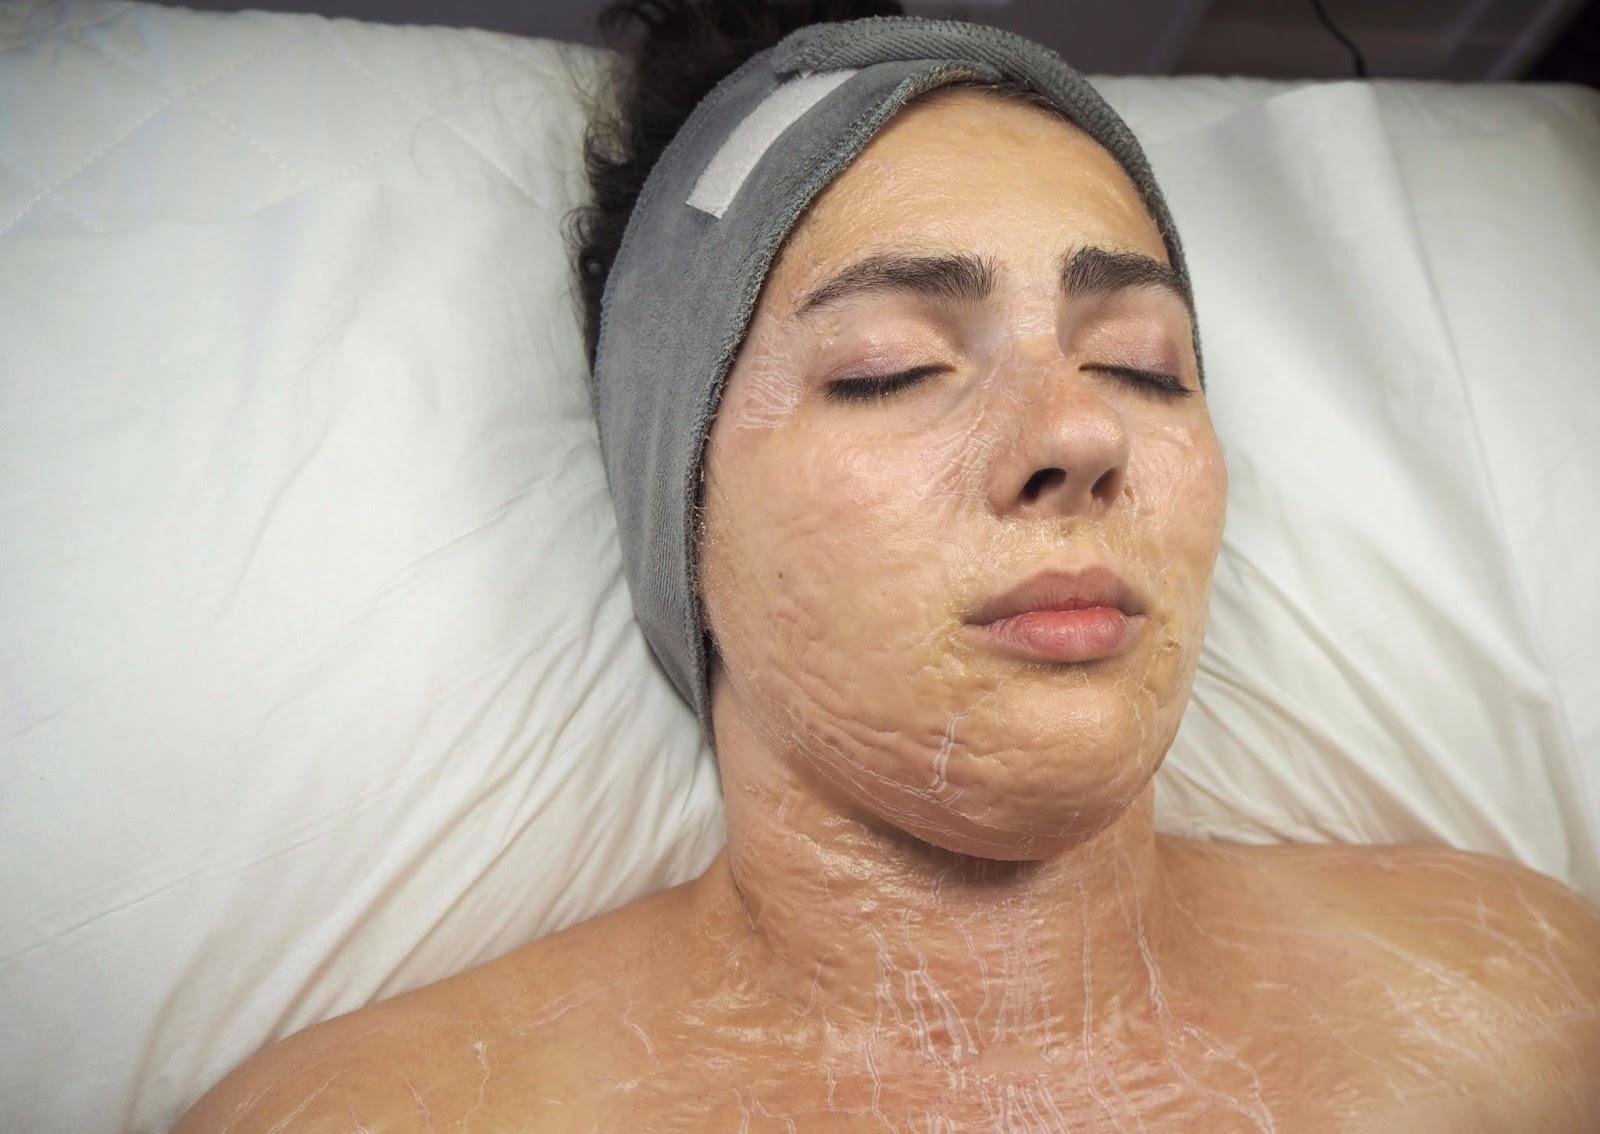 Mask on skin